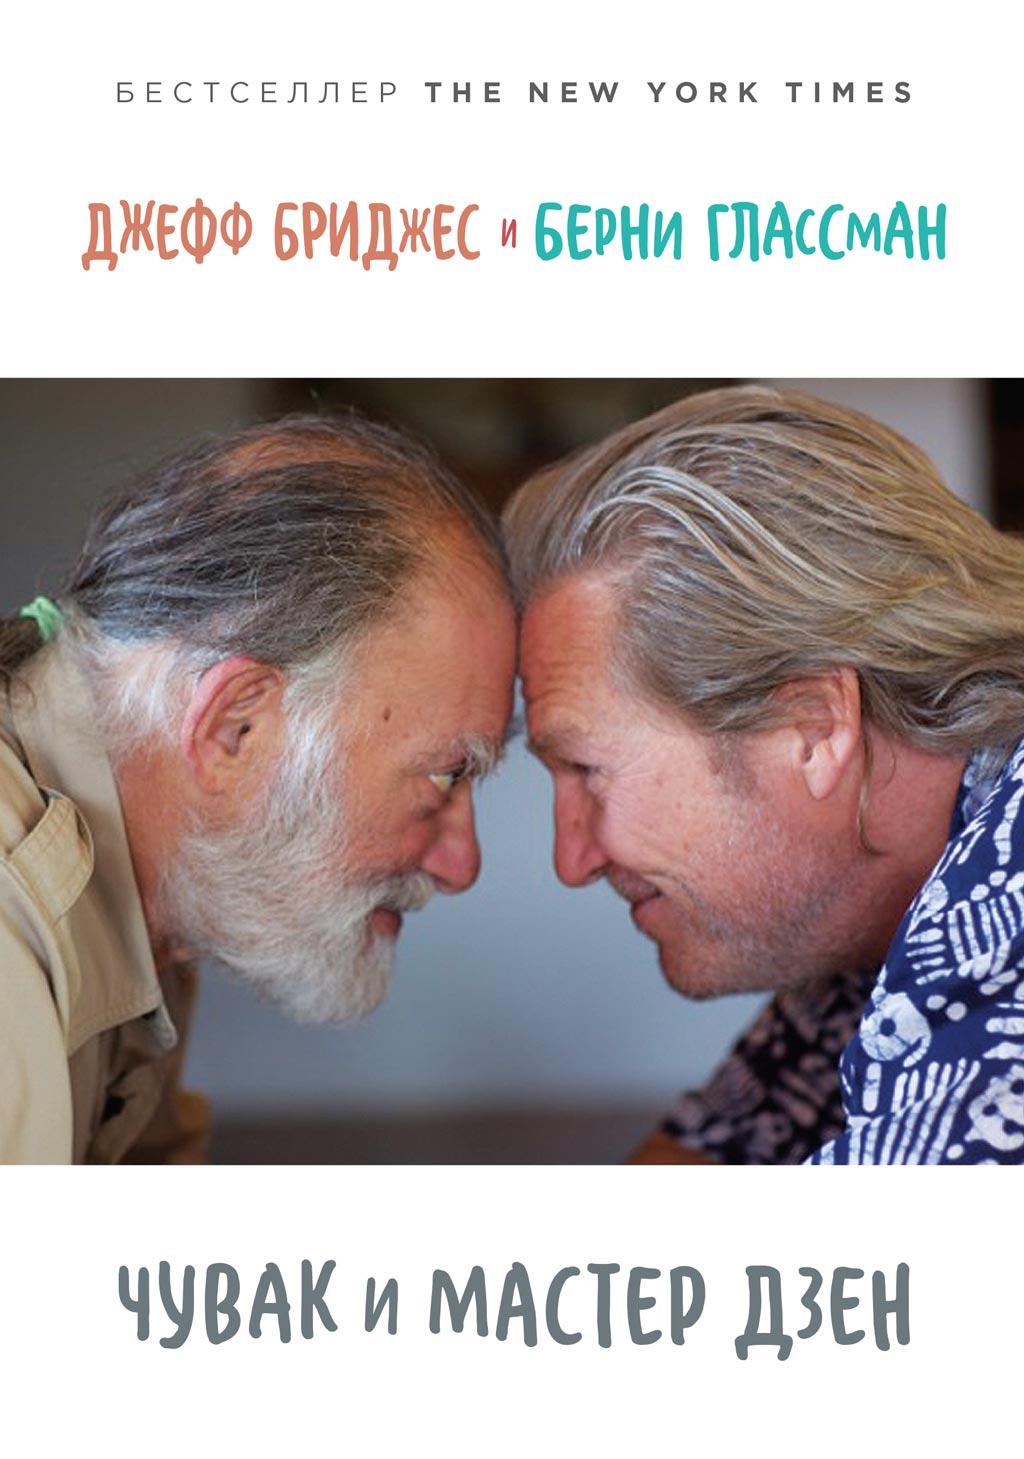 Берни Глассман, Джефф Бриджес, Анна Когтева «Чувак и мастер дзен»